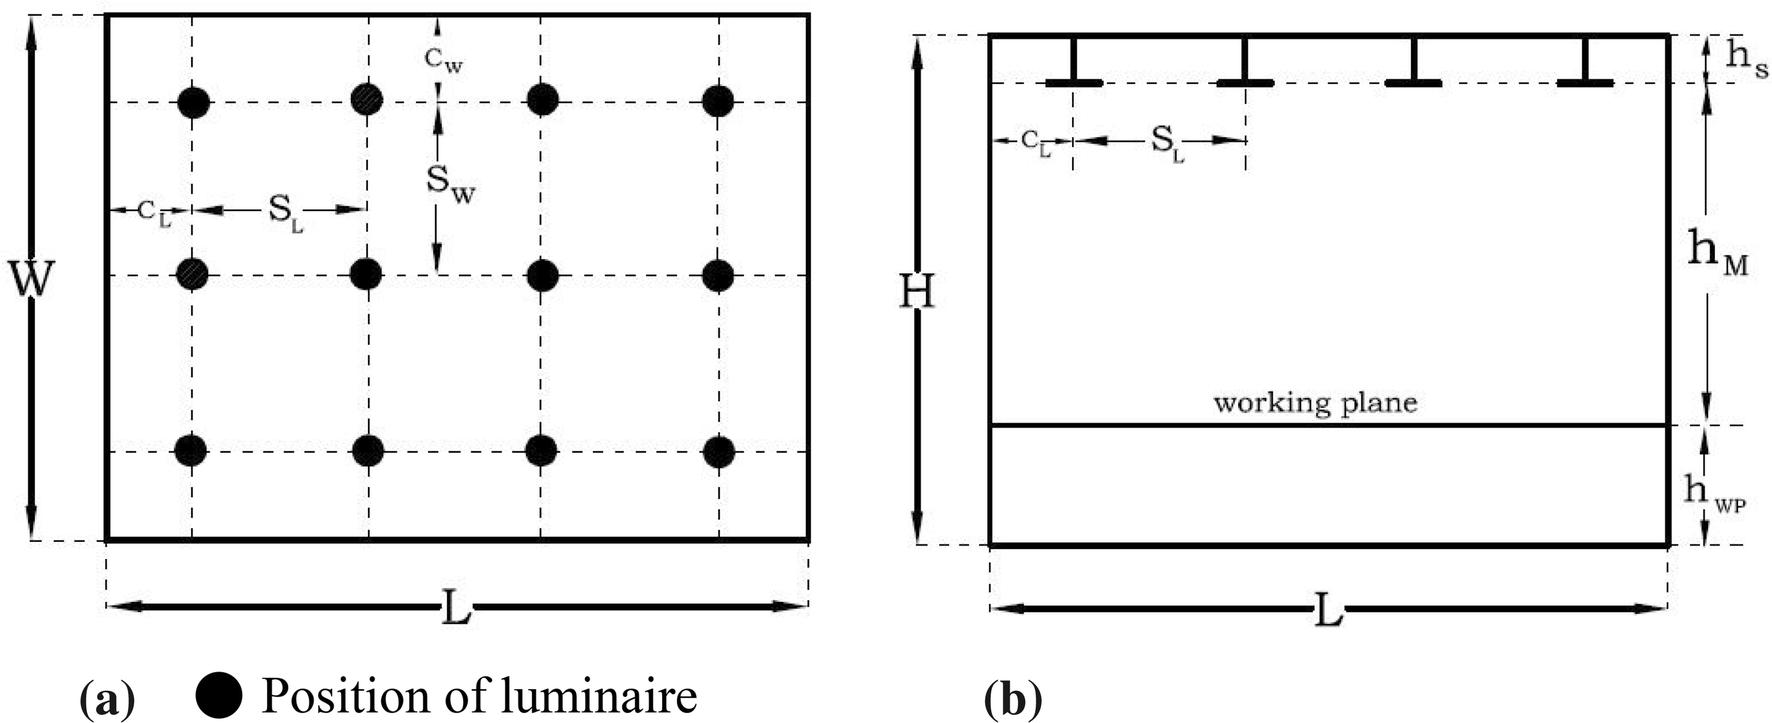 Indoor lighting optimization: a comparative study between grid